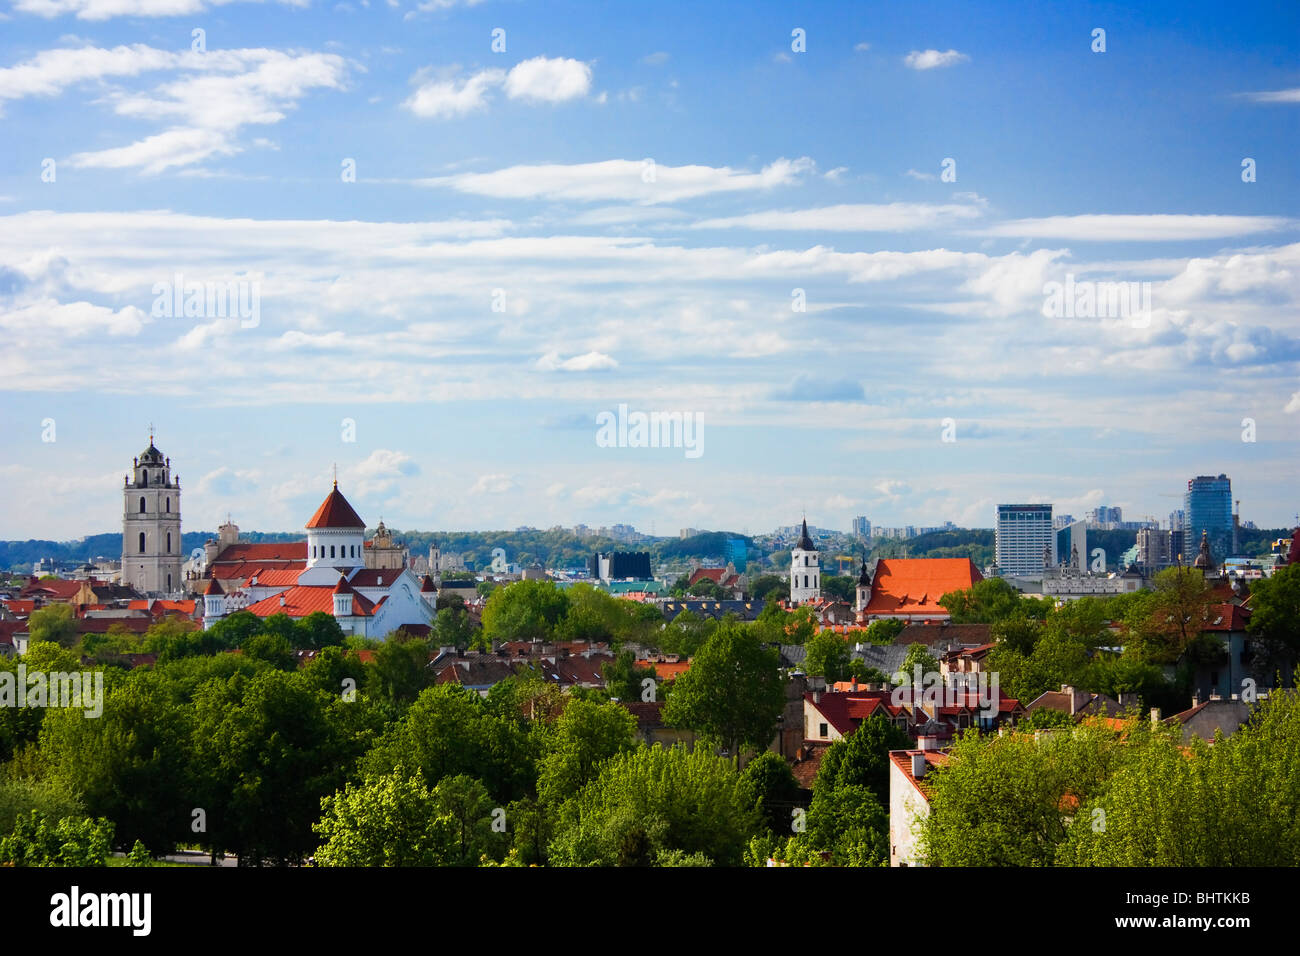 Old town vilnius - Stock Image